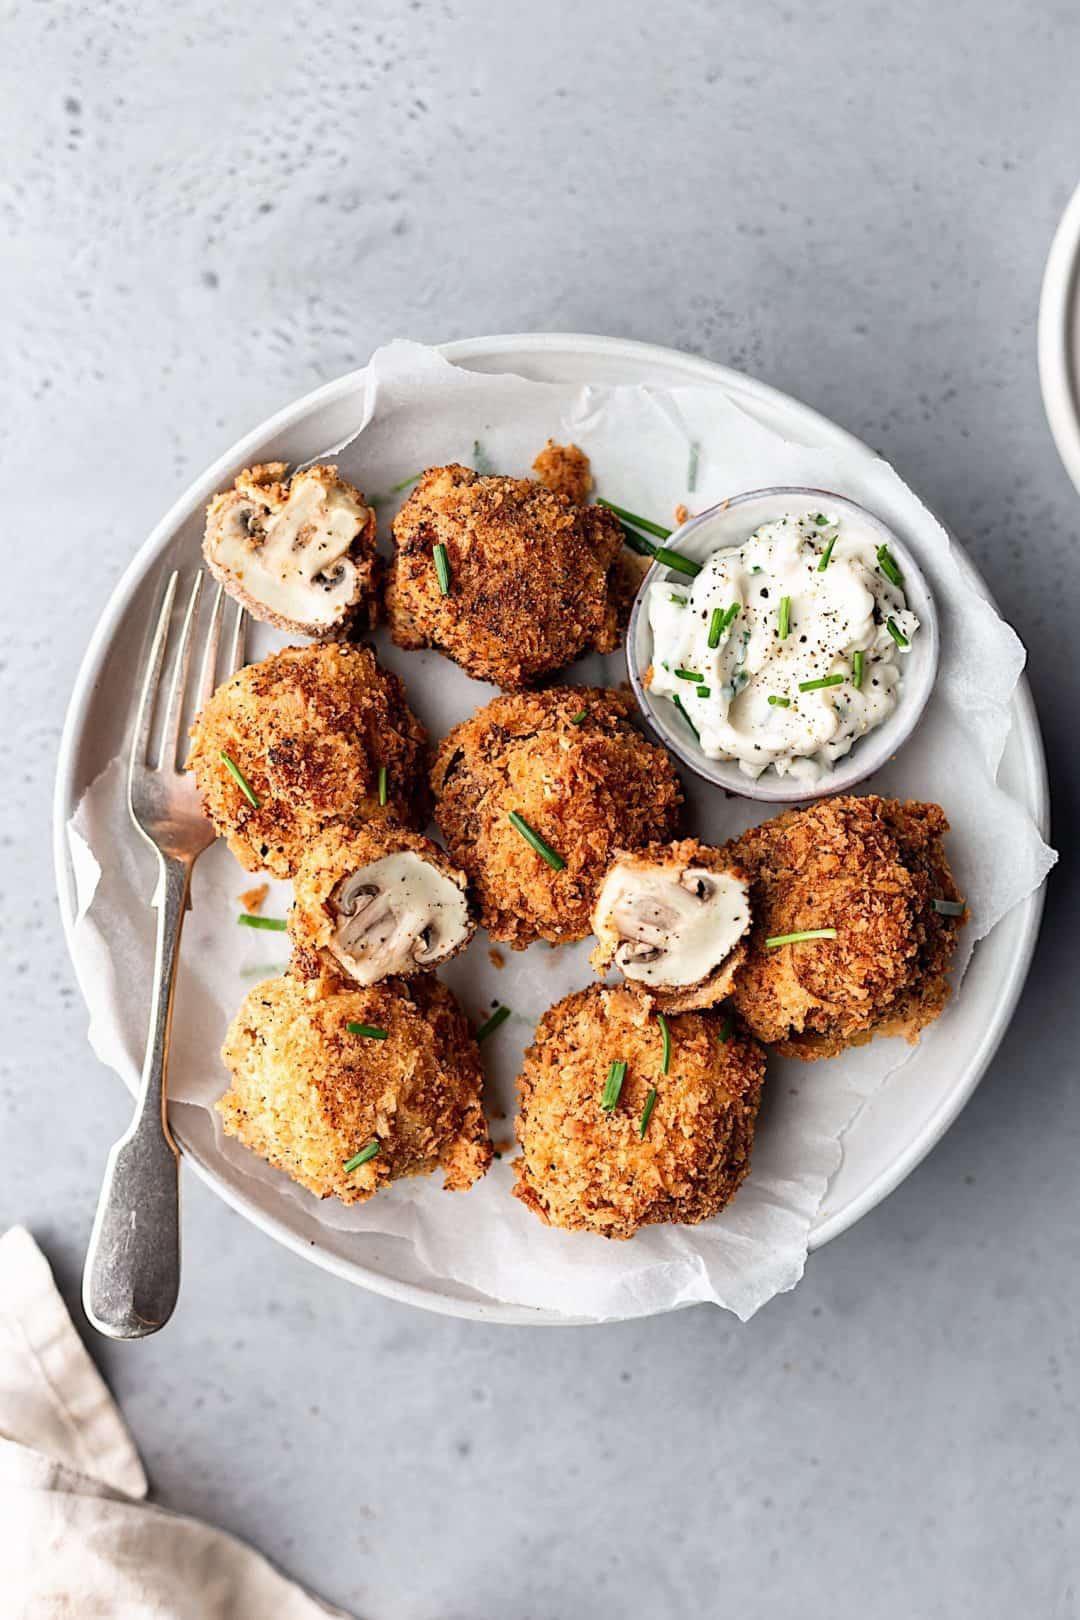 Vegan Crispy Garlic Fried Mushrooms #vegan #recipe #mushrooms